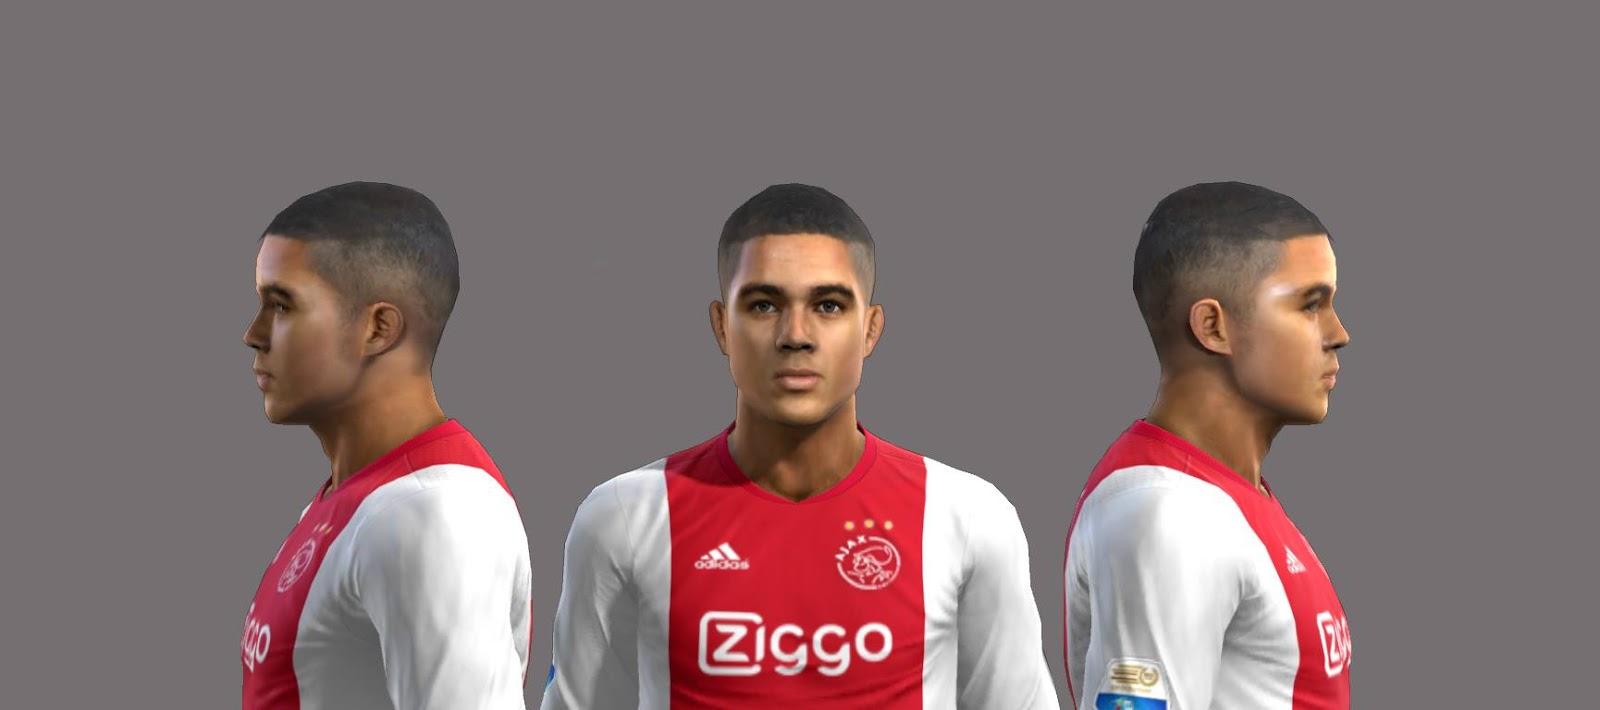 PES 2013 Justin Kluivert (Ajax) Face by EmreT